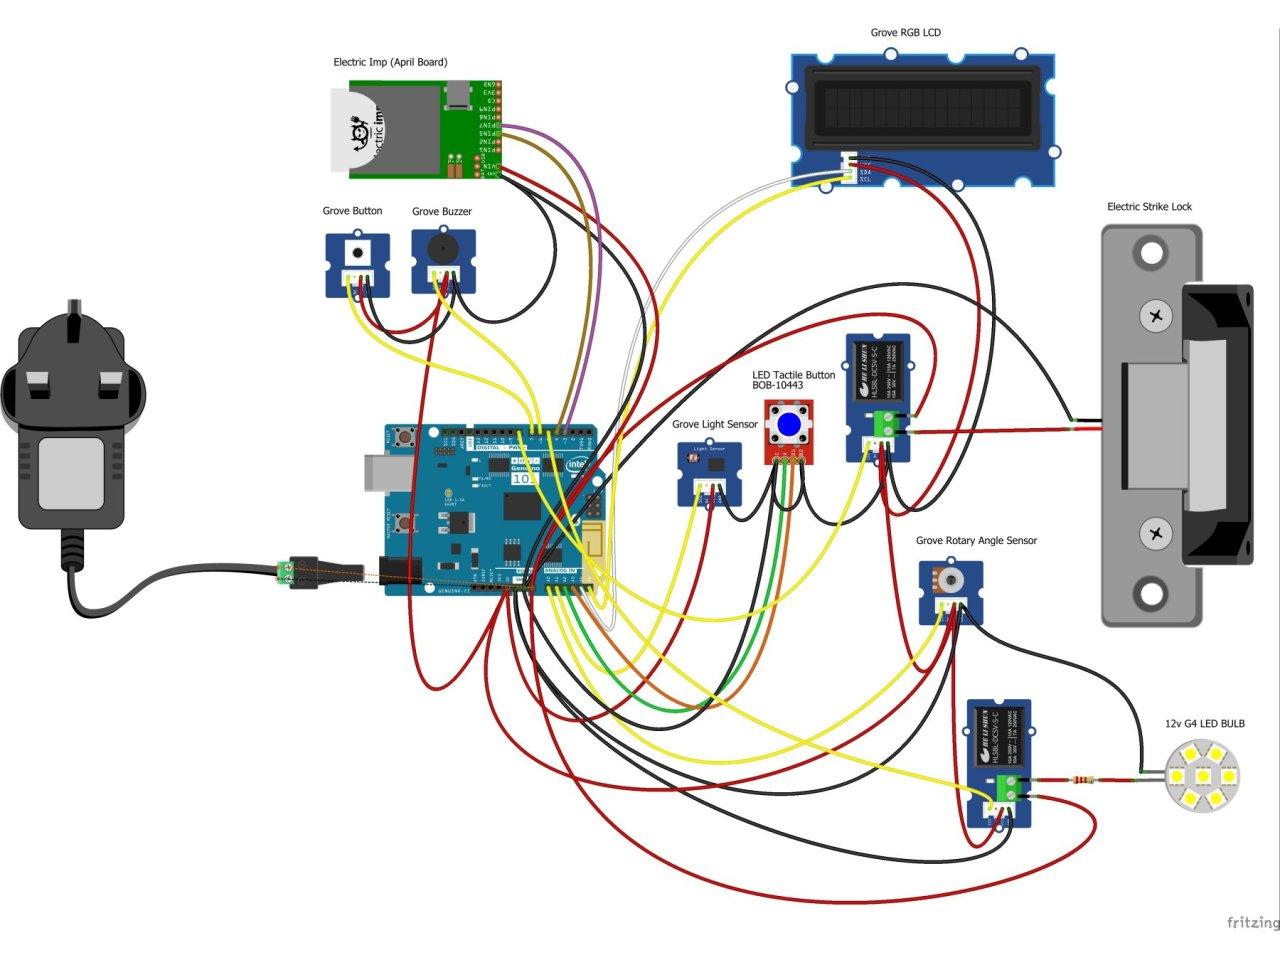 electric strike lock wiring diagram [ 1280 x 960 Pixel ]